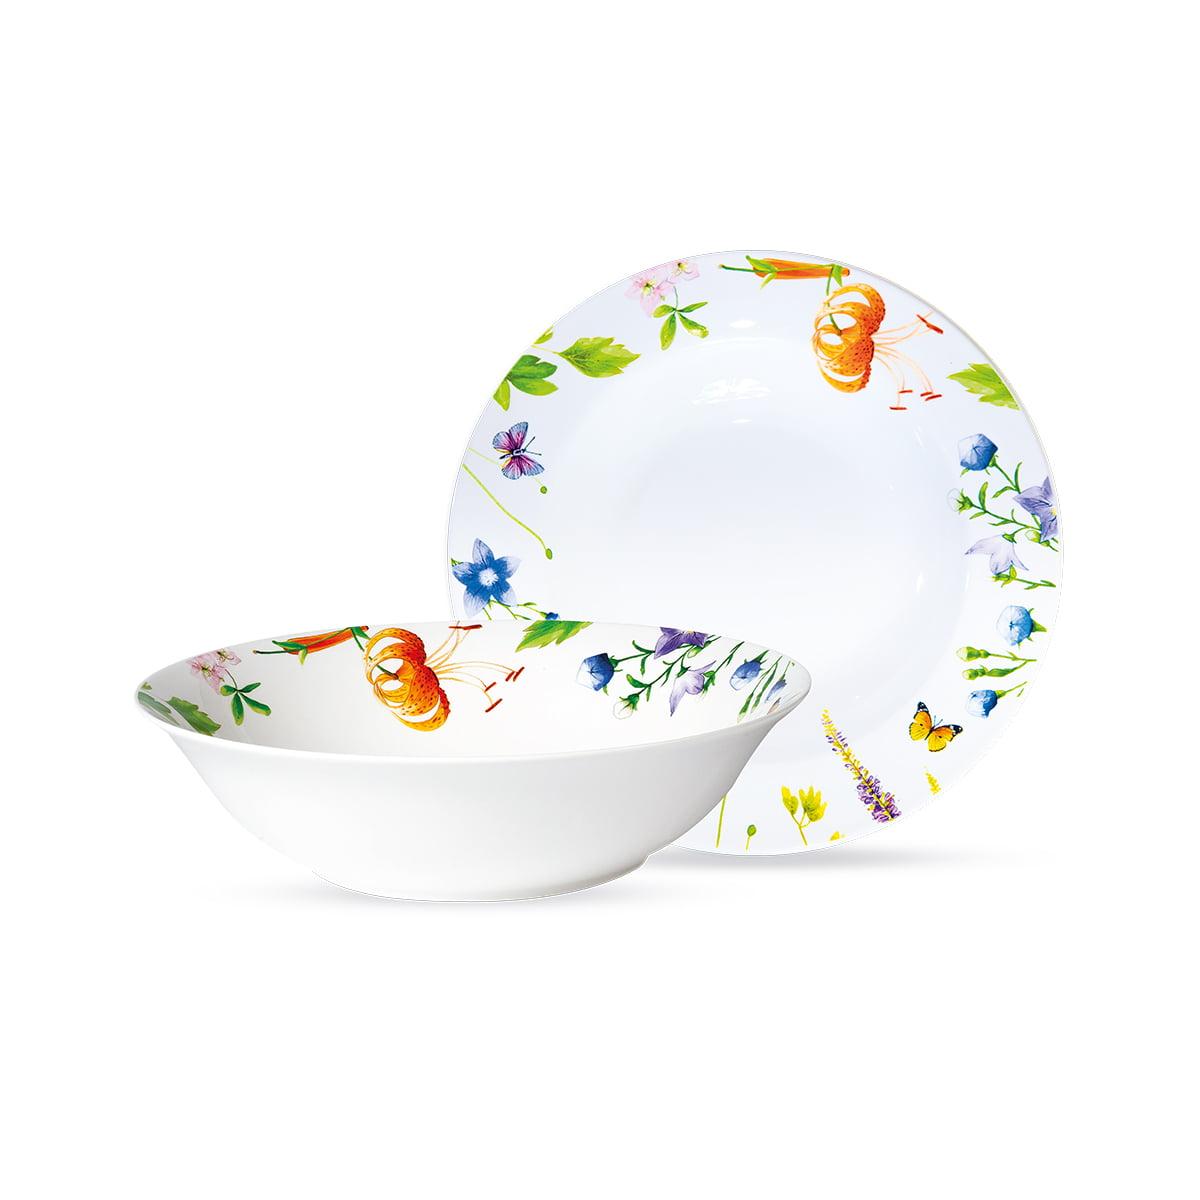 Butterfly porcelanski set za ručavanje 1 - Činija